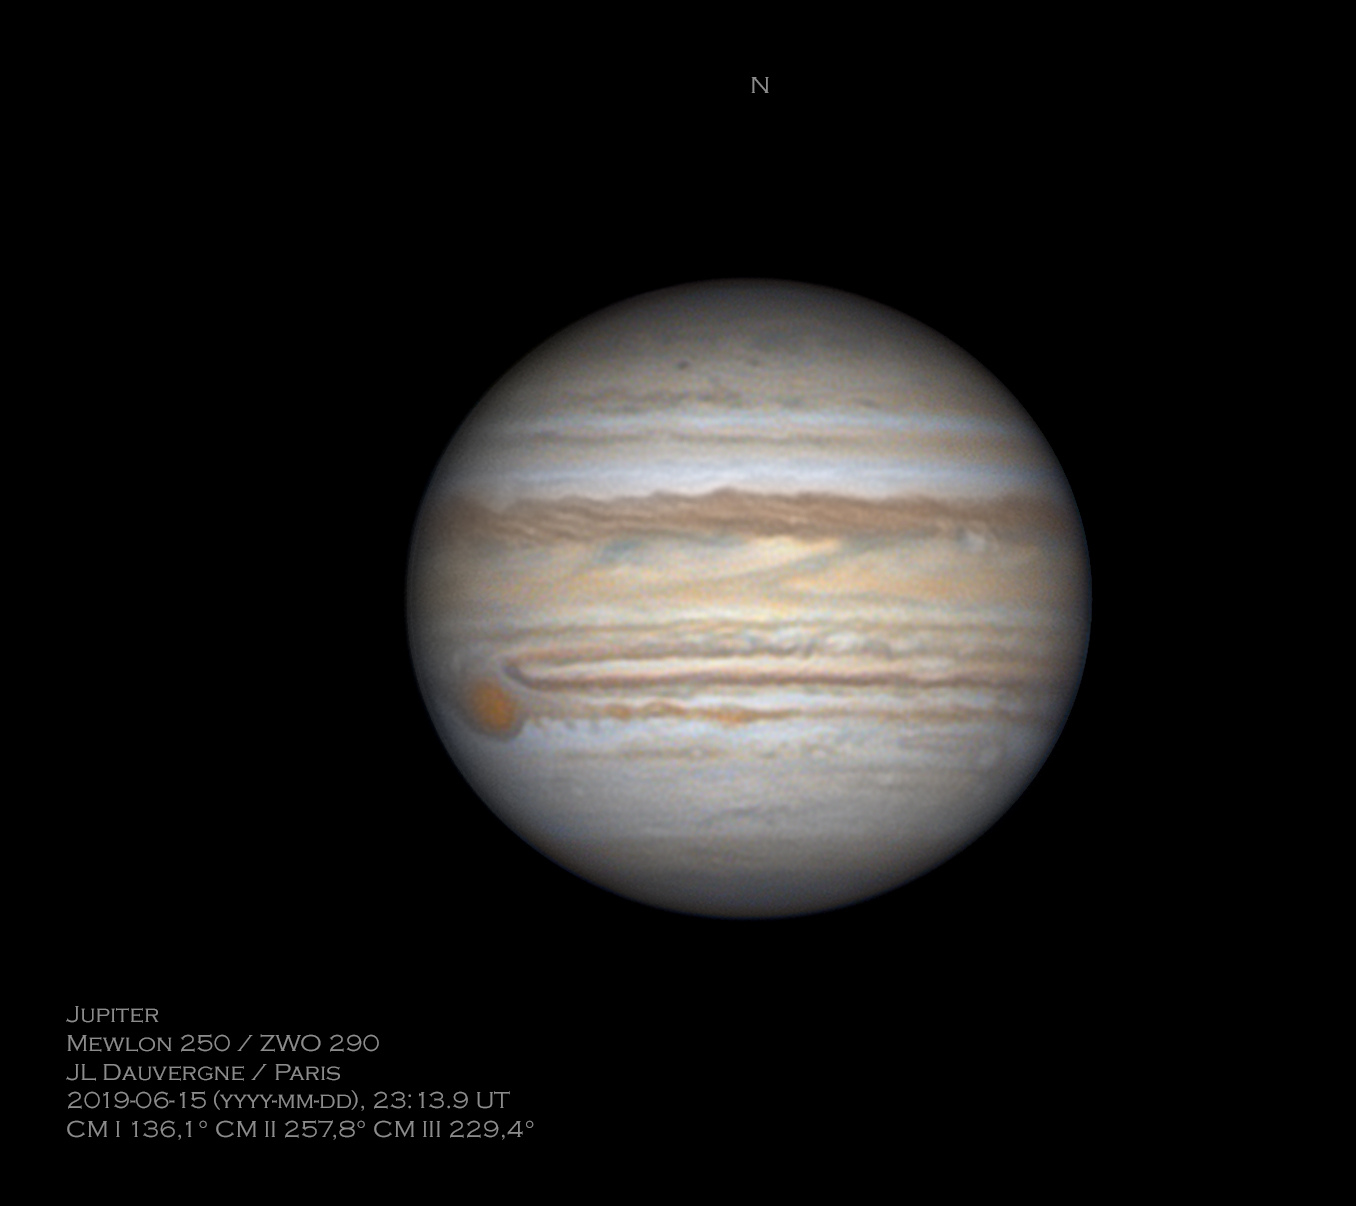 5d0aaaabe9c11_2019-06-15-2313_9-L-Jupiter_ZWOASI290MMMini_lapl7_ap205.jpg.6b10d78bf66895633eb278974363294e.jpg